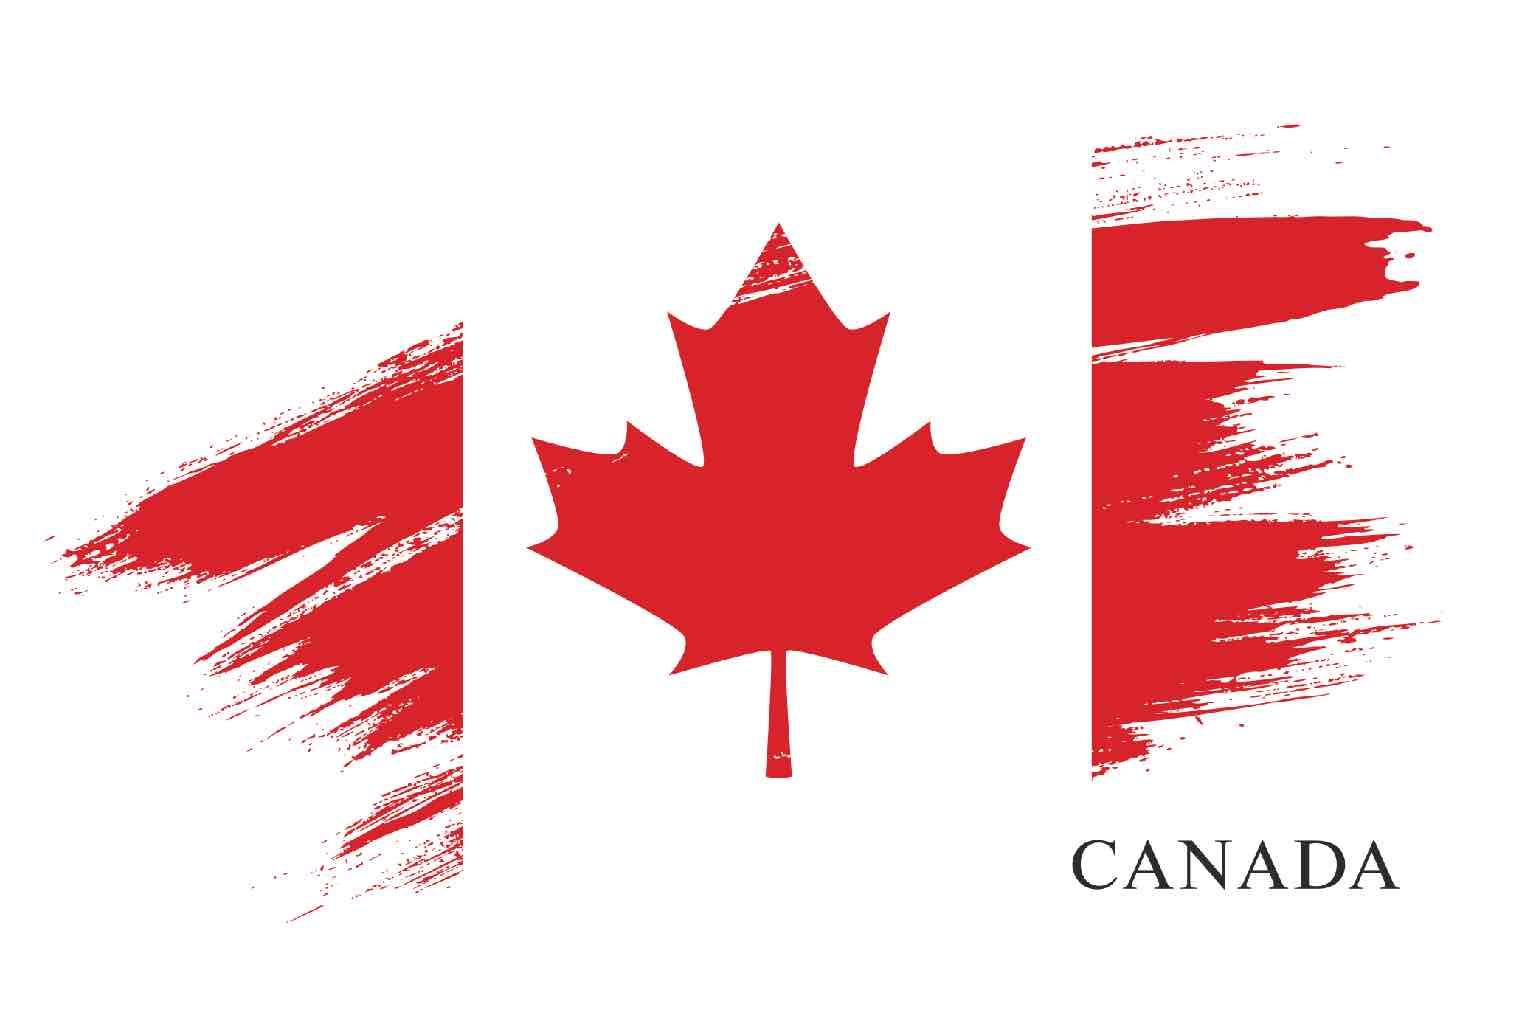 Artistically stressed Canadian flag